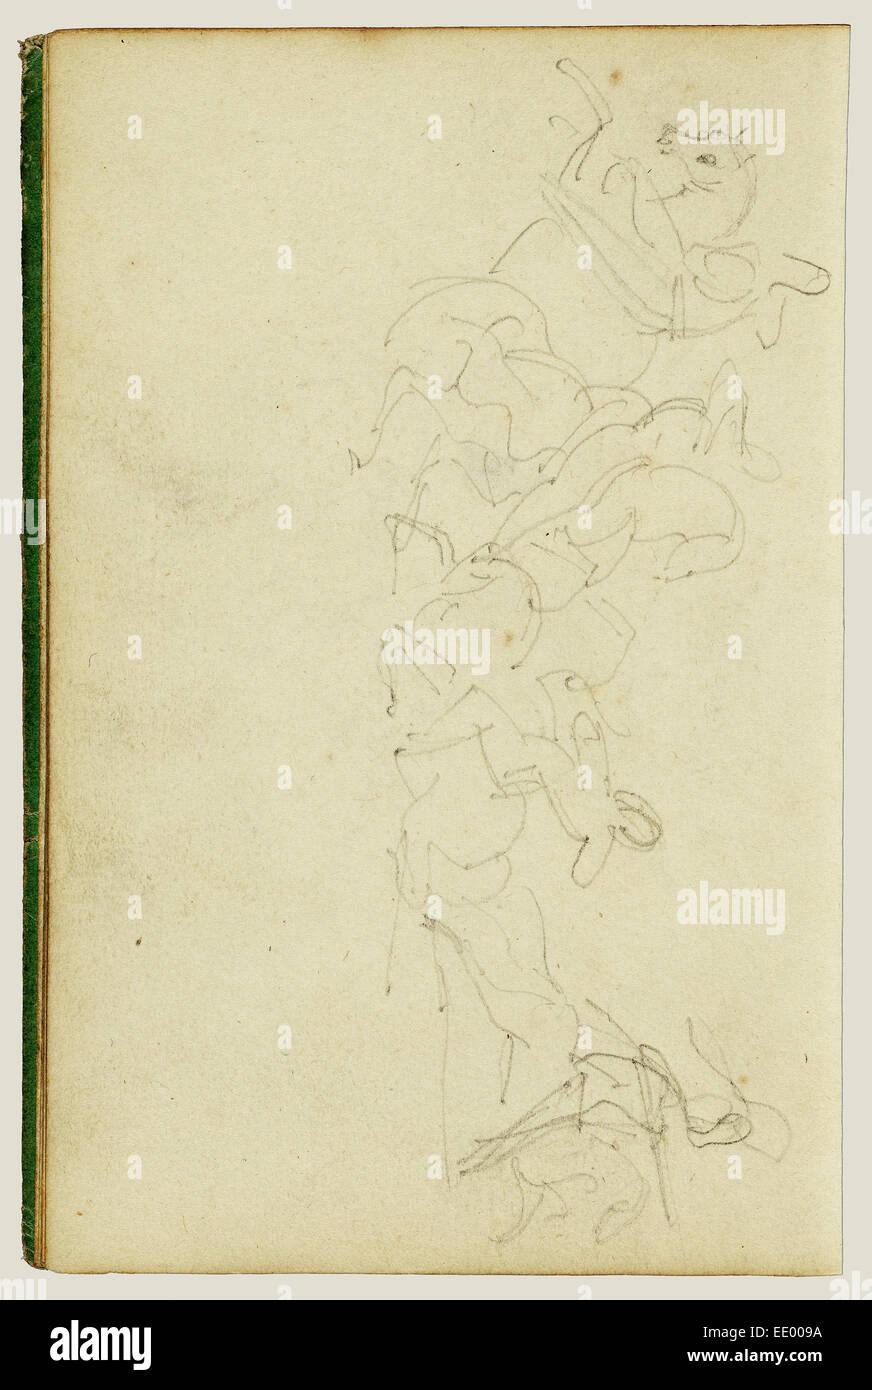 Calvary skirmish with four horsemen; Théodore Géricault, French, 1791 - 1824; 1812 - 1814; Graphite - Stock Image